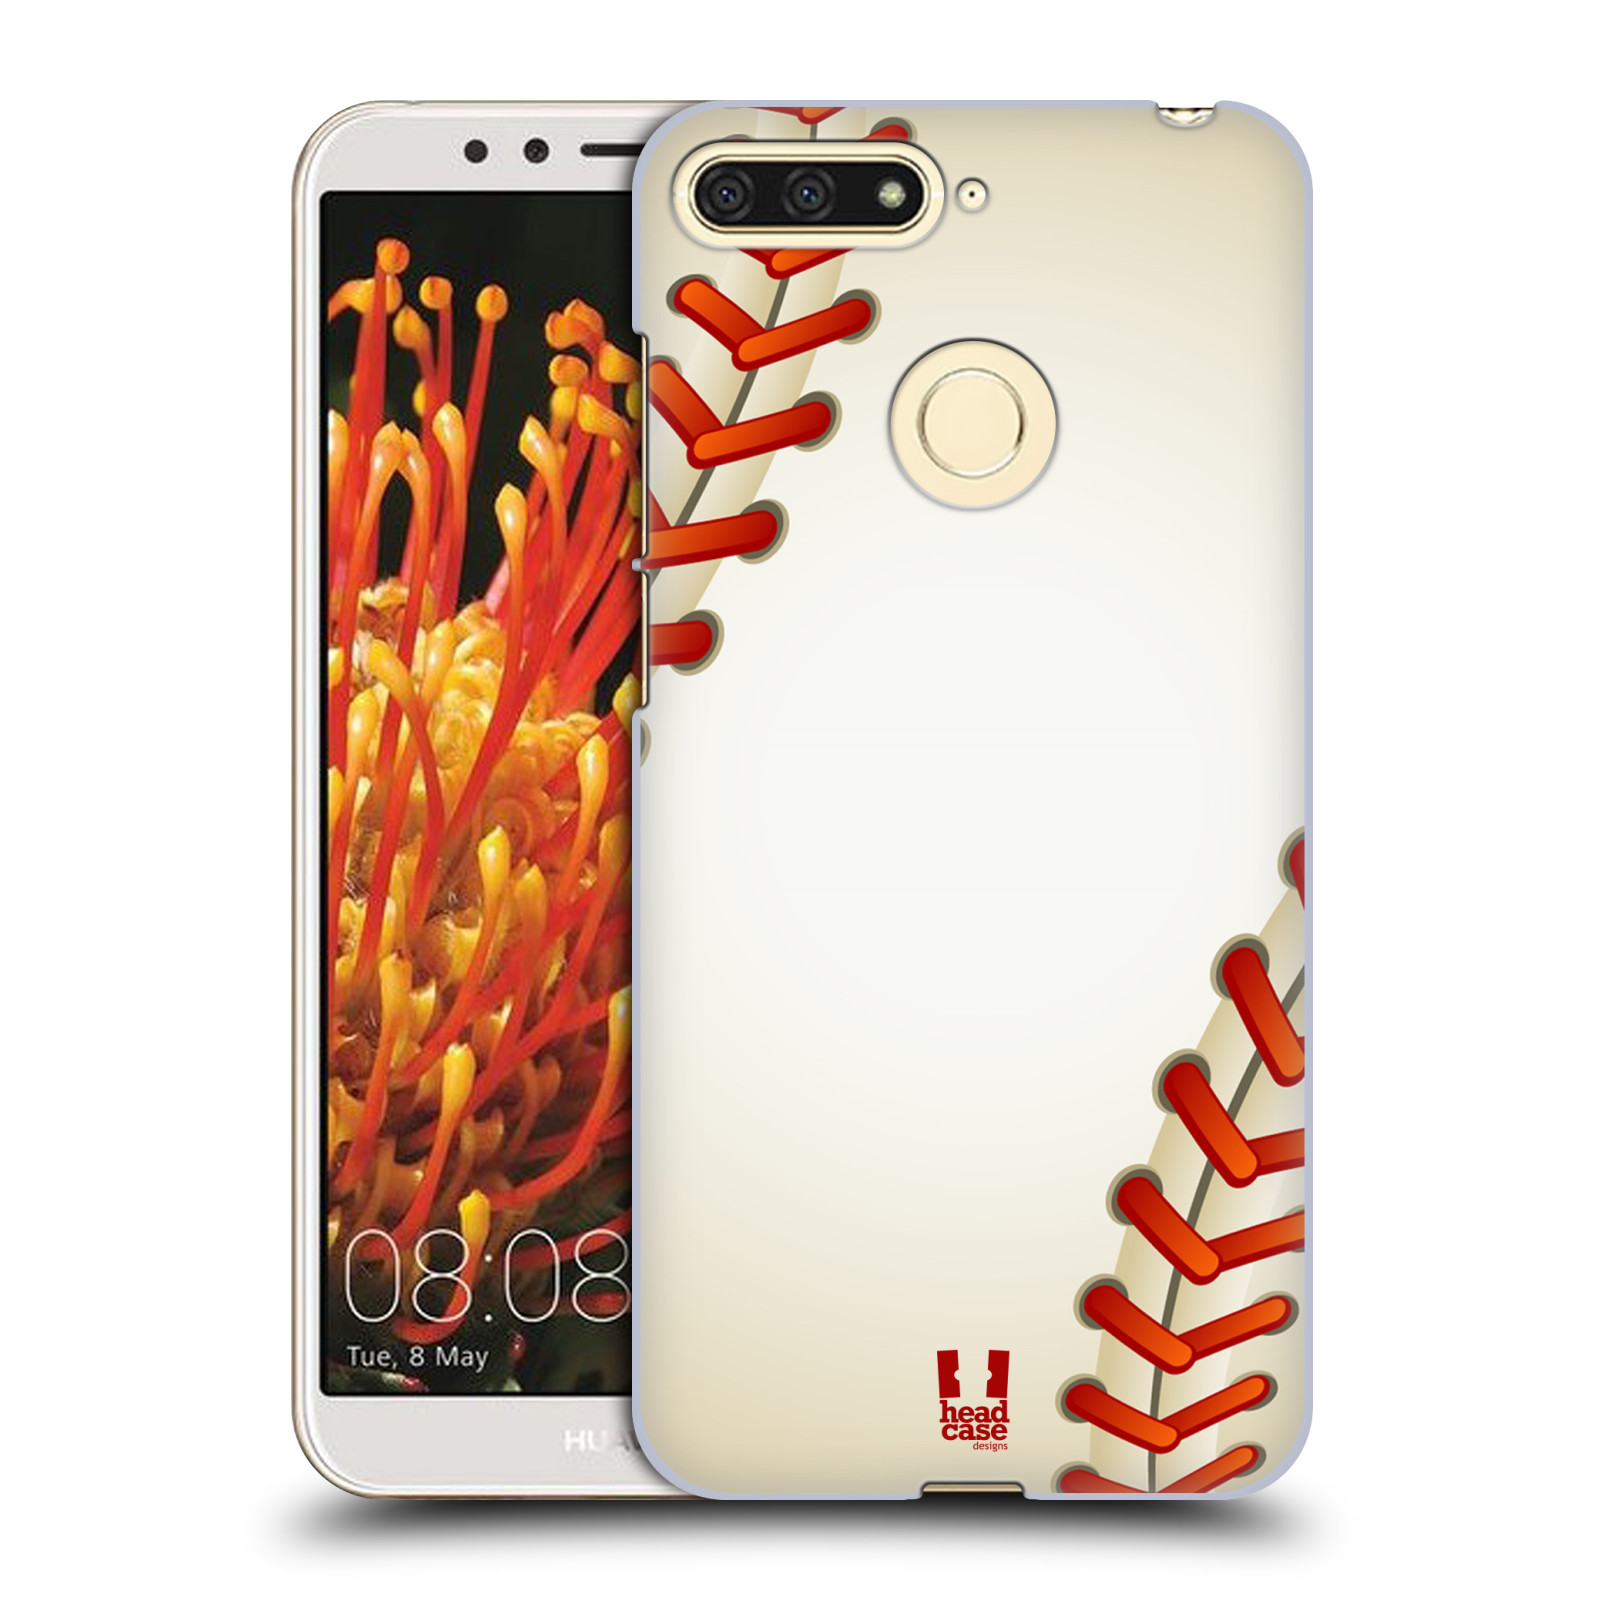 Plastové pouzdro na mobil Huawei Y6 Prime 2018 - Head Case - Baseballový míček